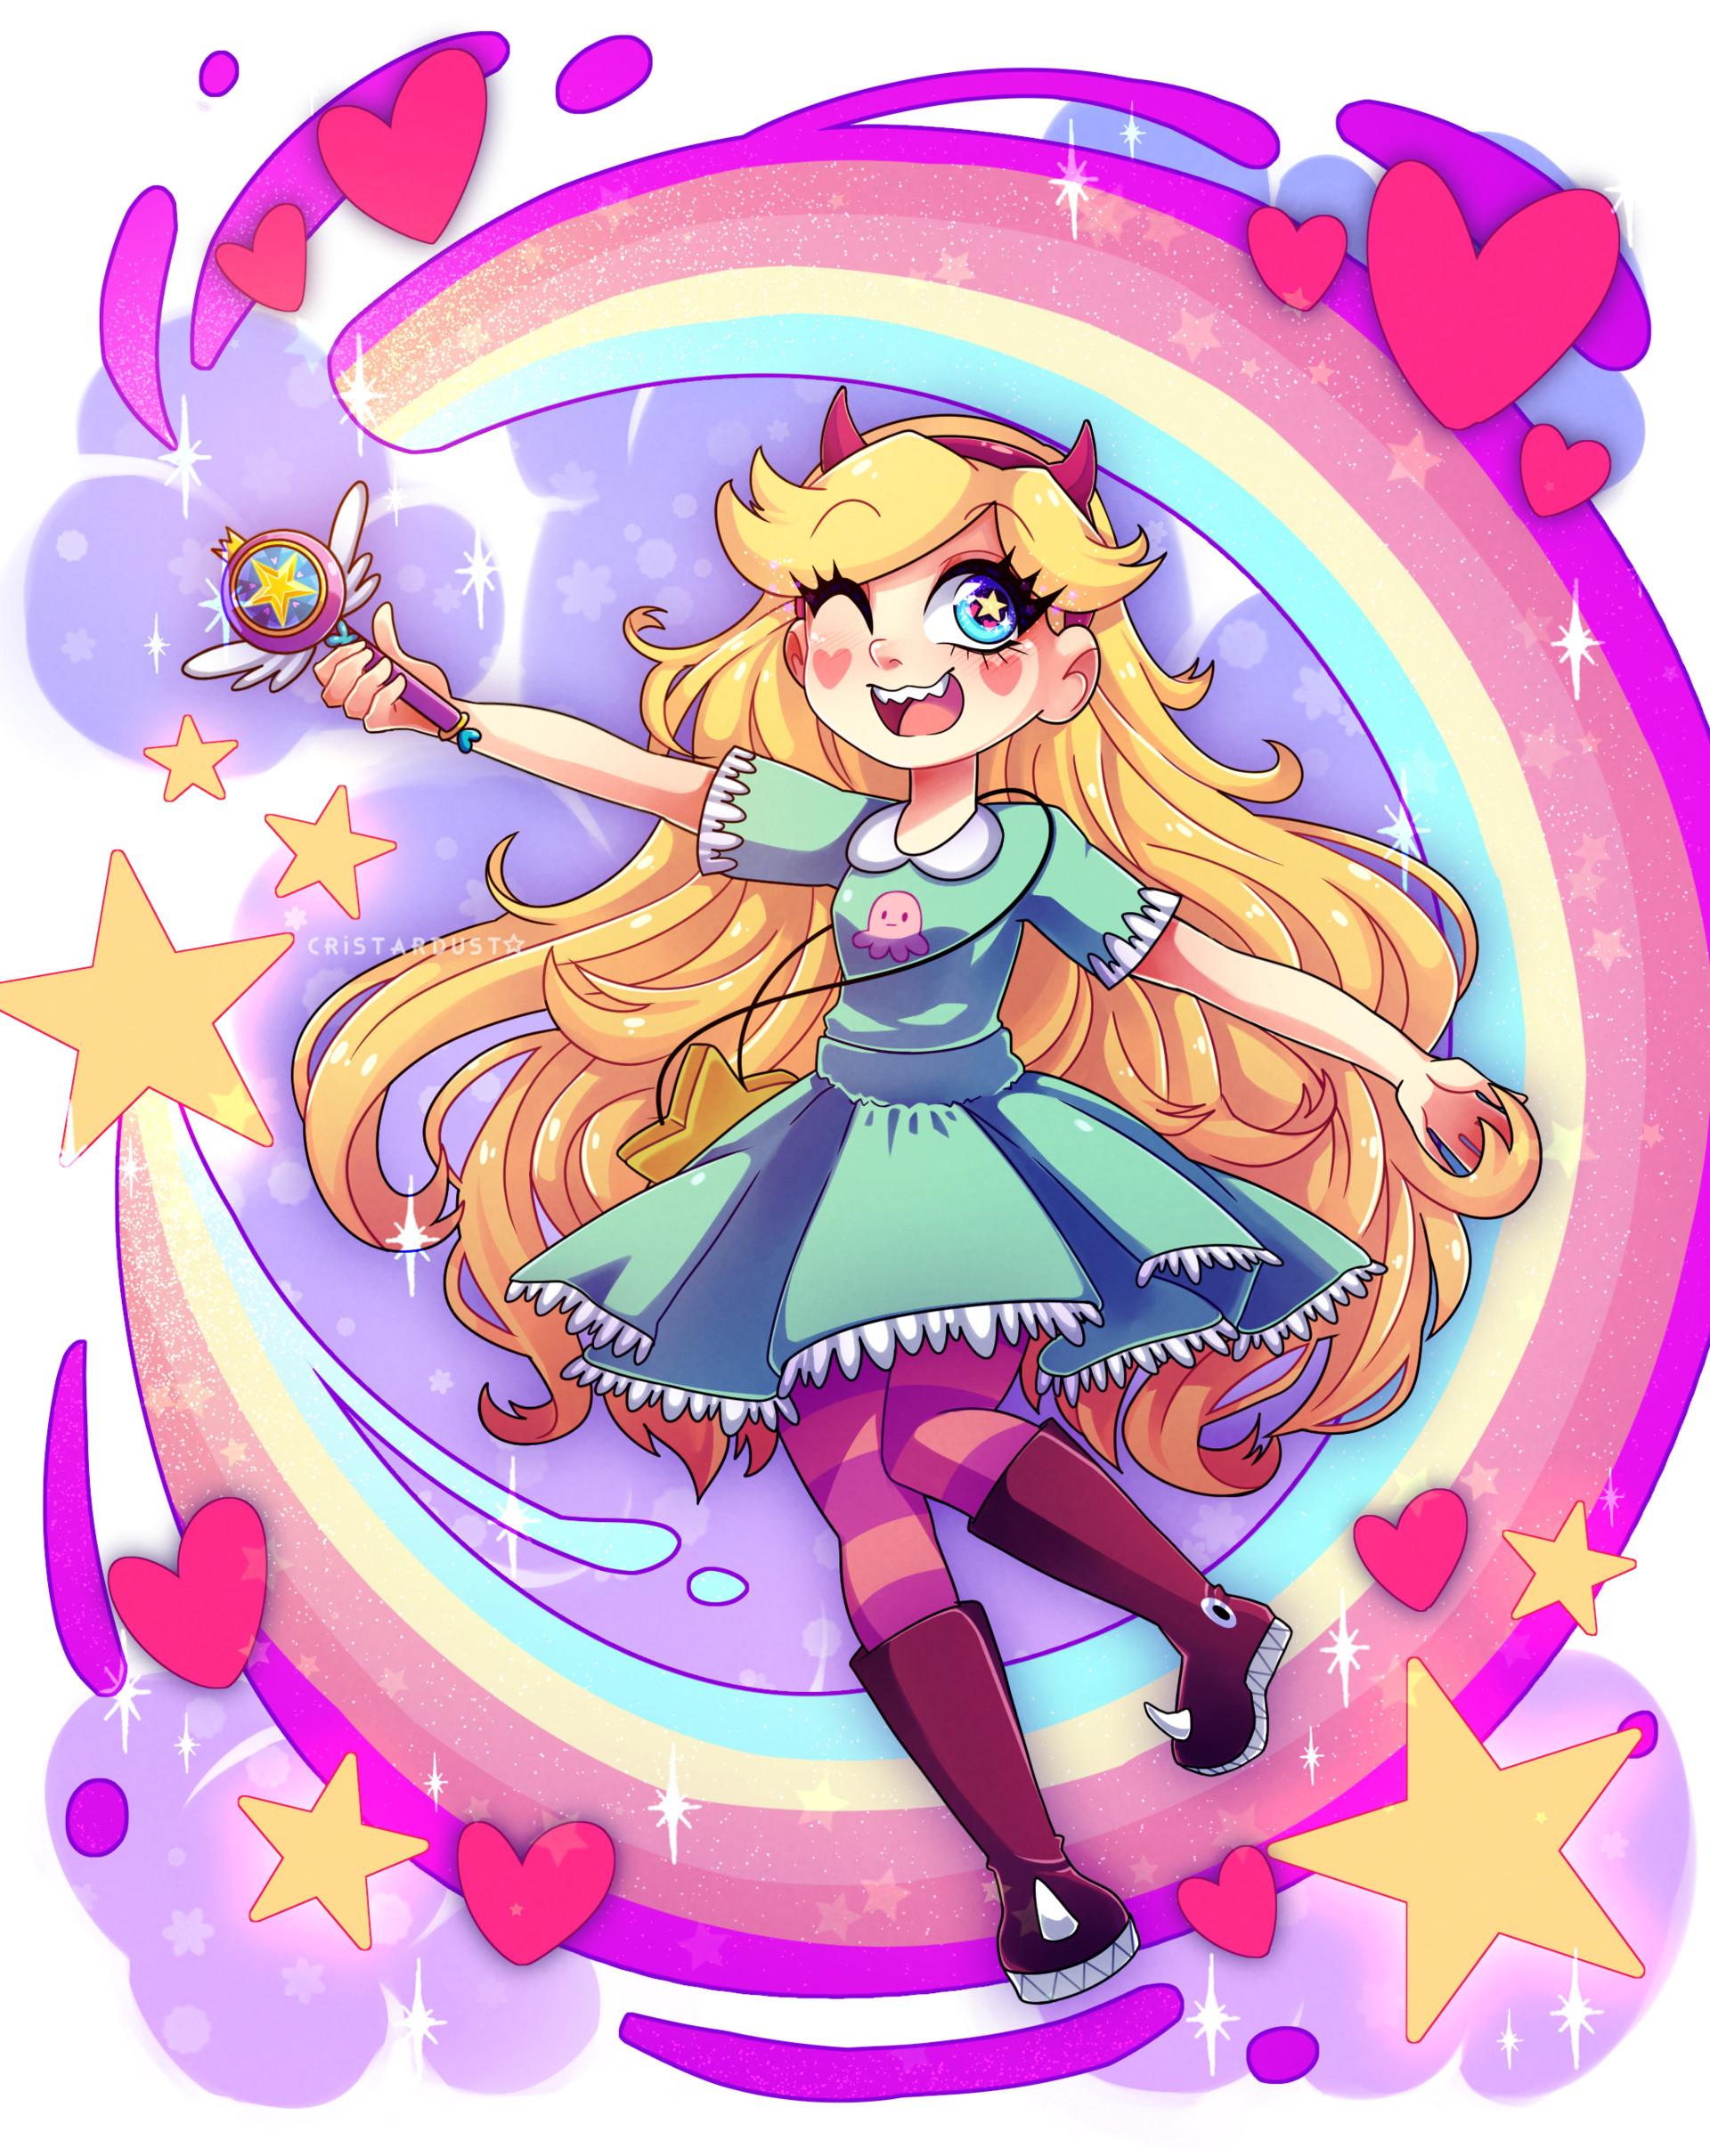 Star_butterfly